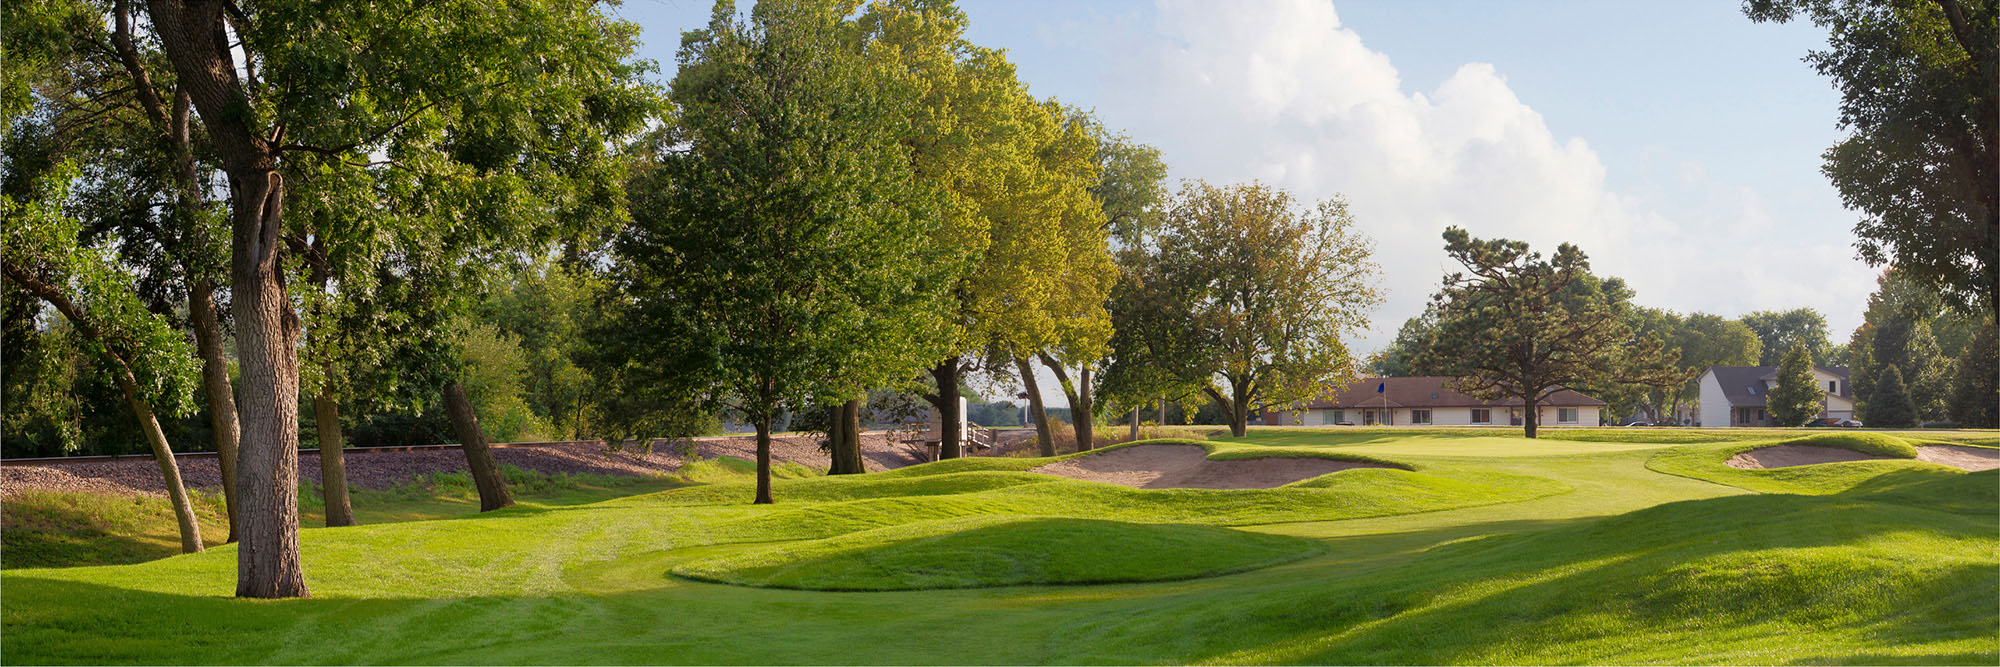 Golf Course Image - Fremont No. 17